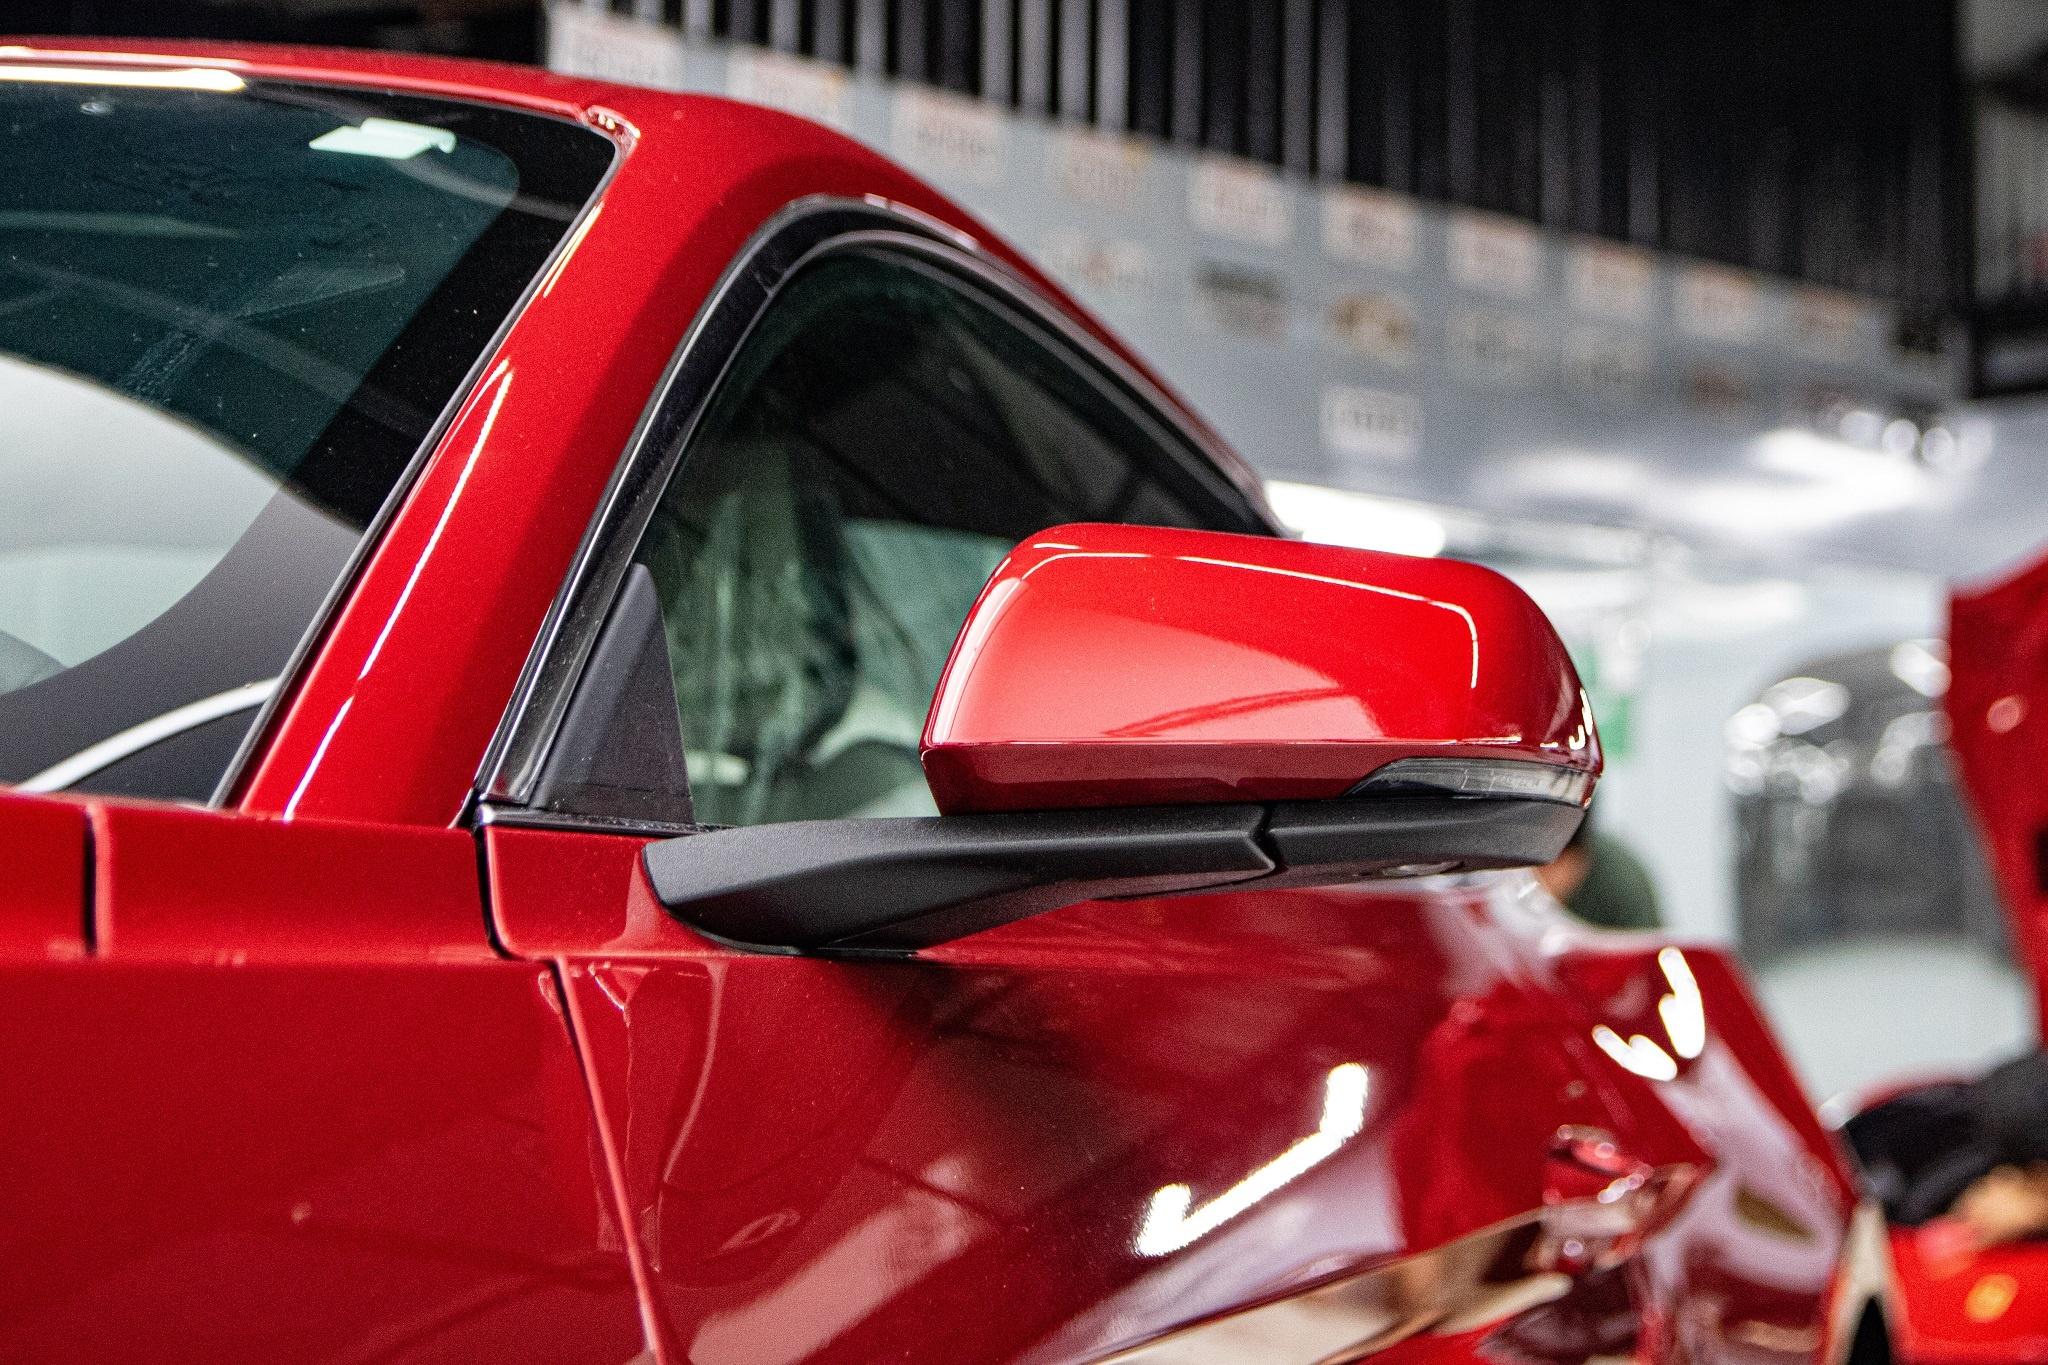 Ford Mustang 2020 phien ban ky niem vua ve VN, gia hon 3 ty hinh anh 15 Mustang_55_edition_zing_43_.jpg